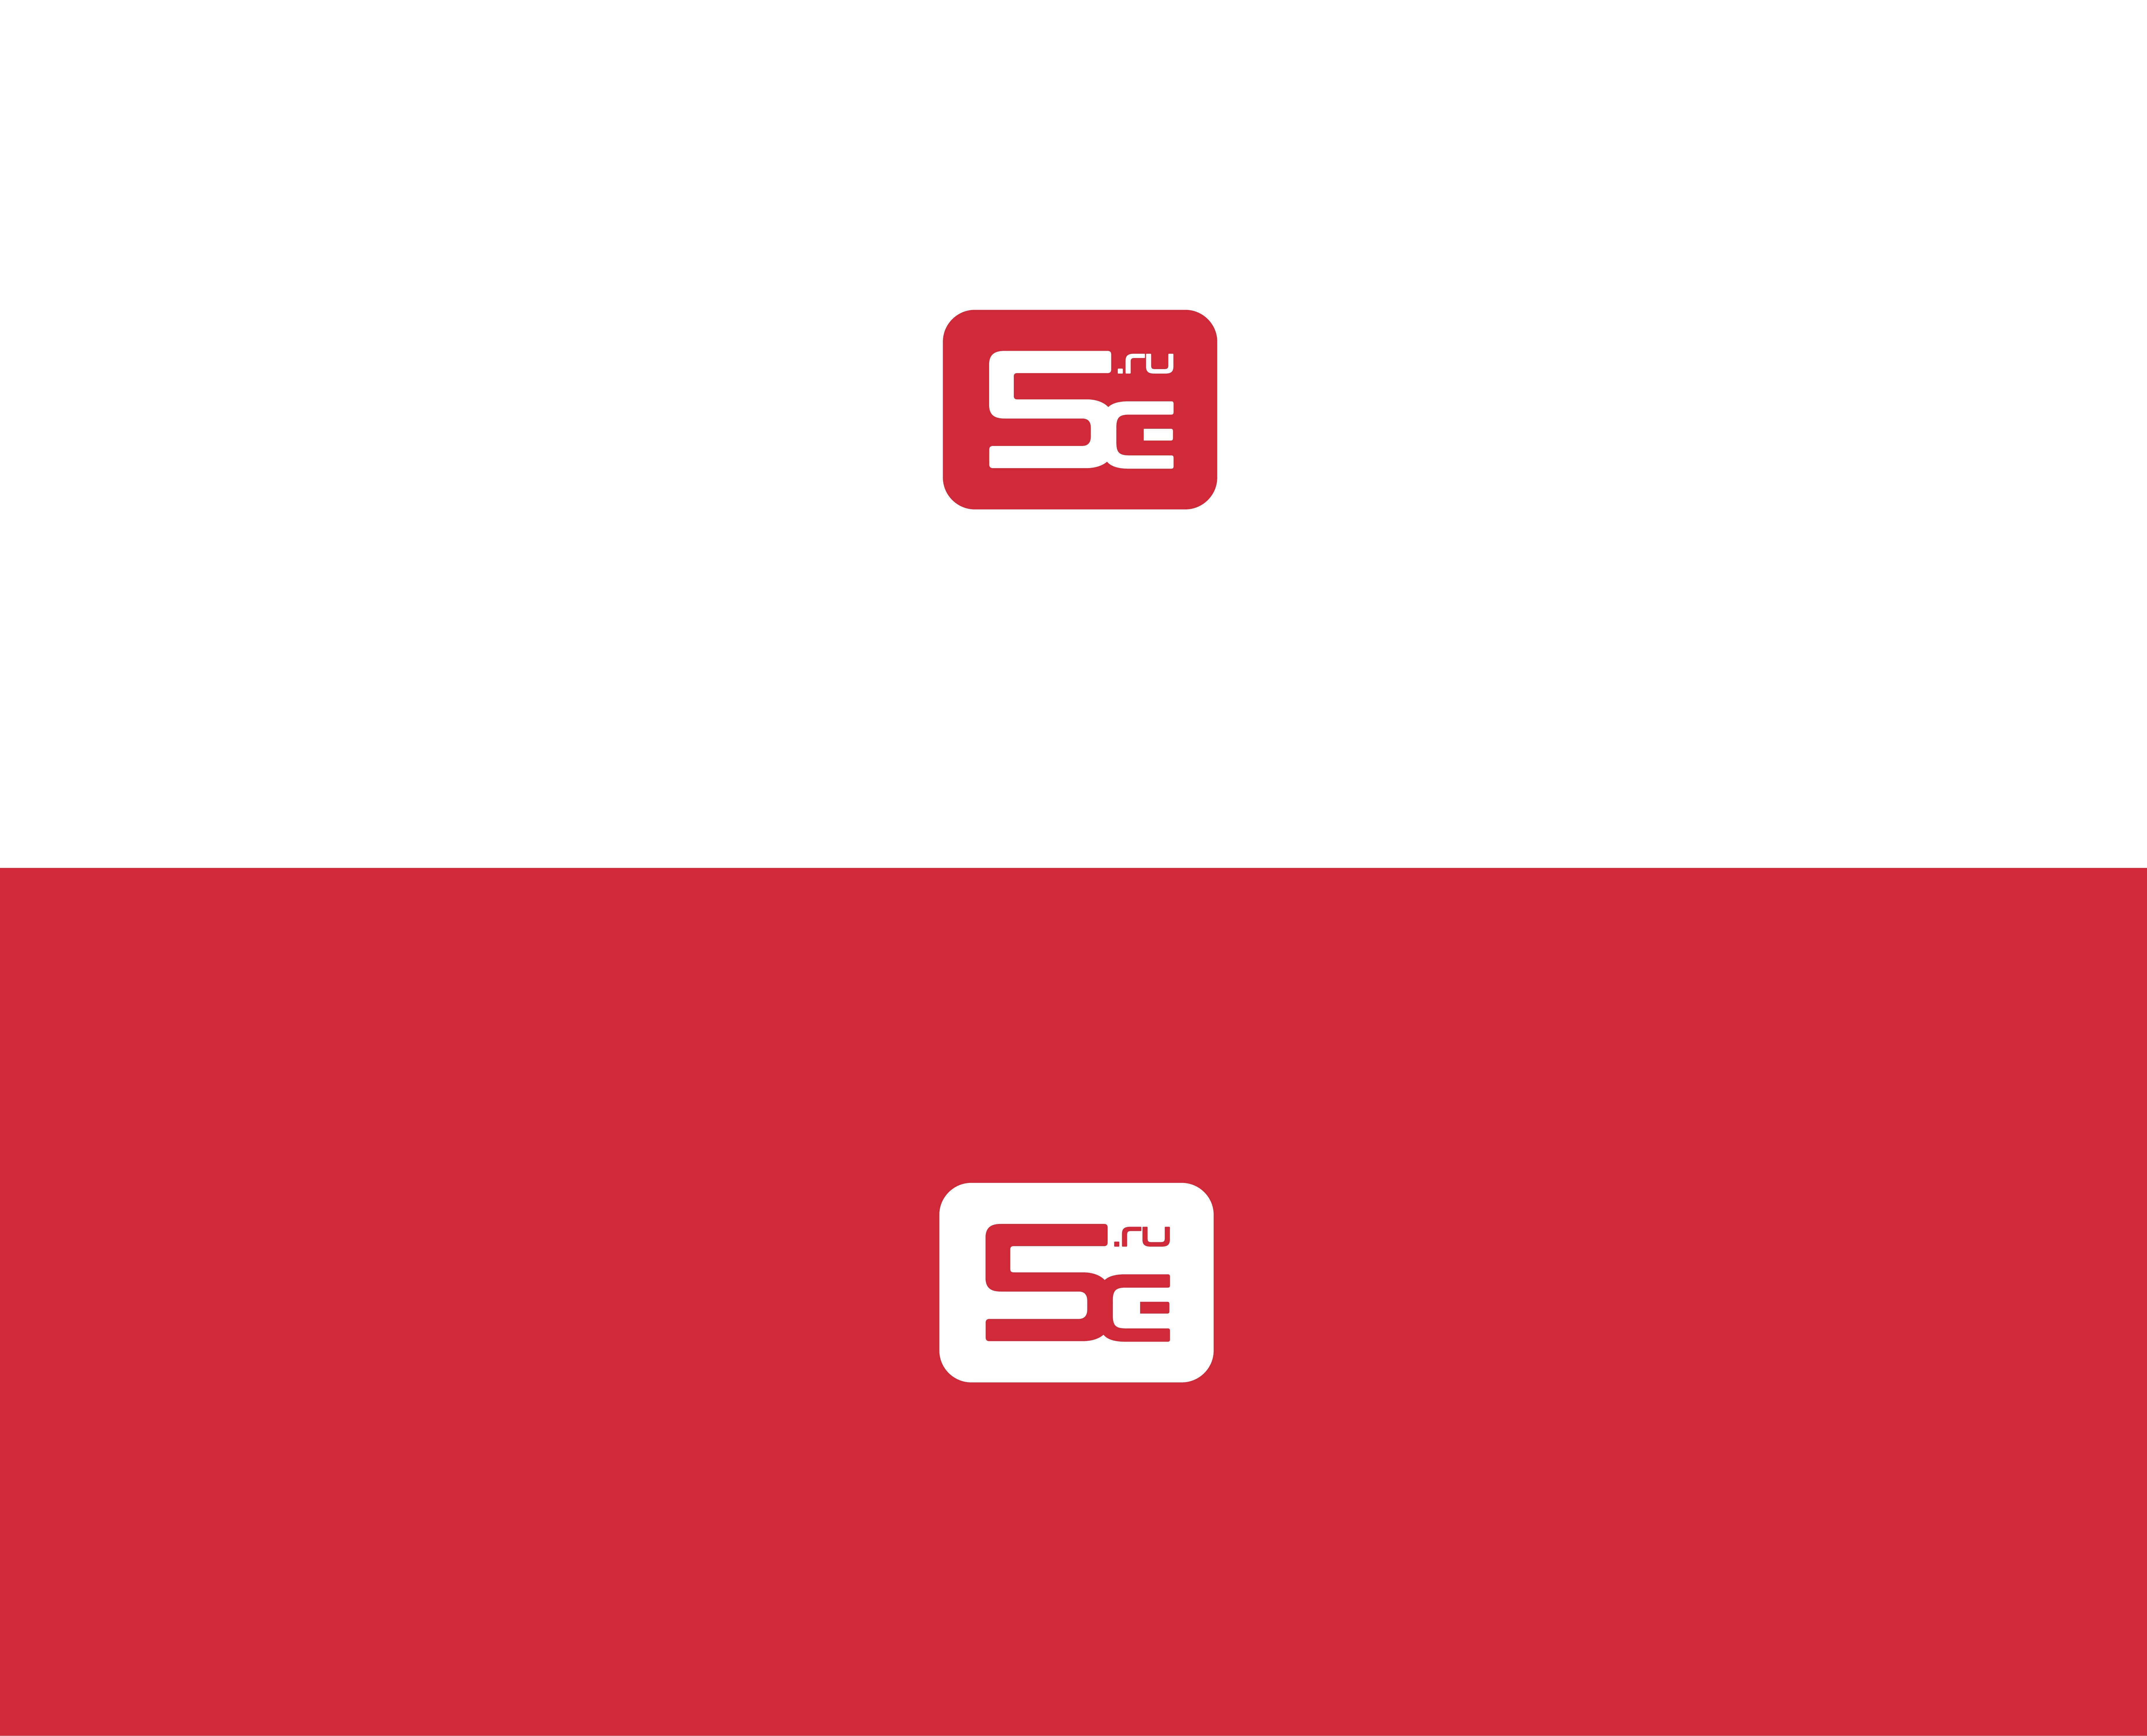 Нарисовать логотип для группы компаний  фото f_5815cddbfc96c66a.jpg